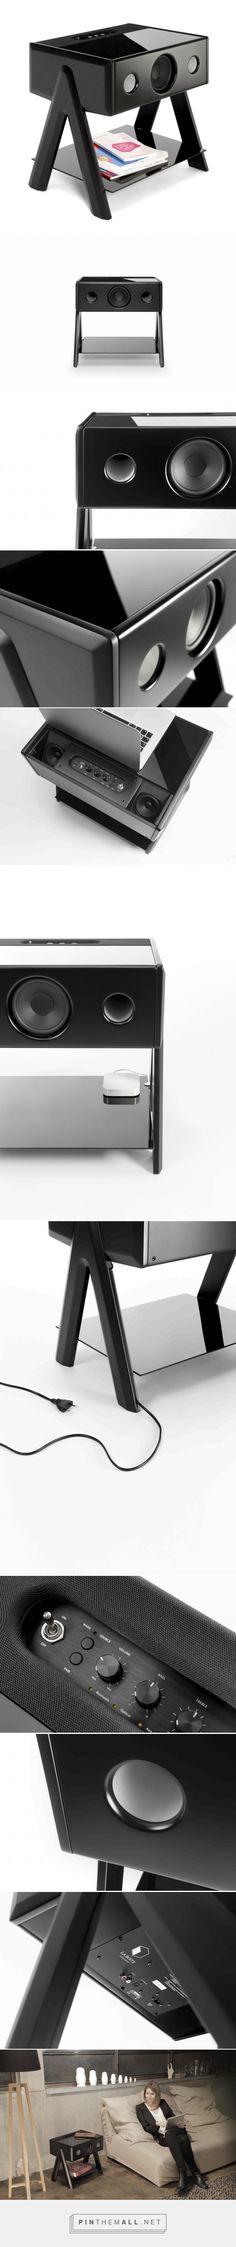 Cube Thruster 2.1 | Fubiz For SPOOTNIK - created via http://pinthemall.net